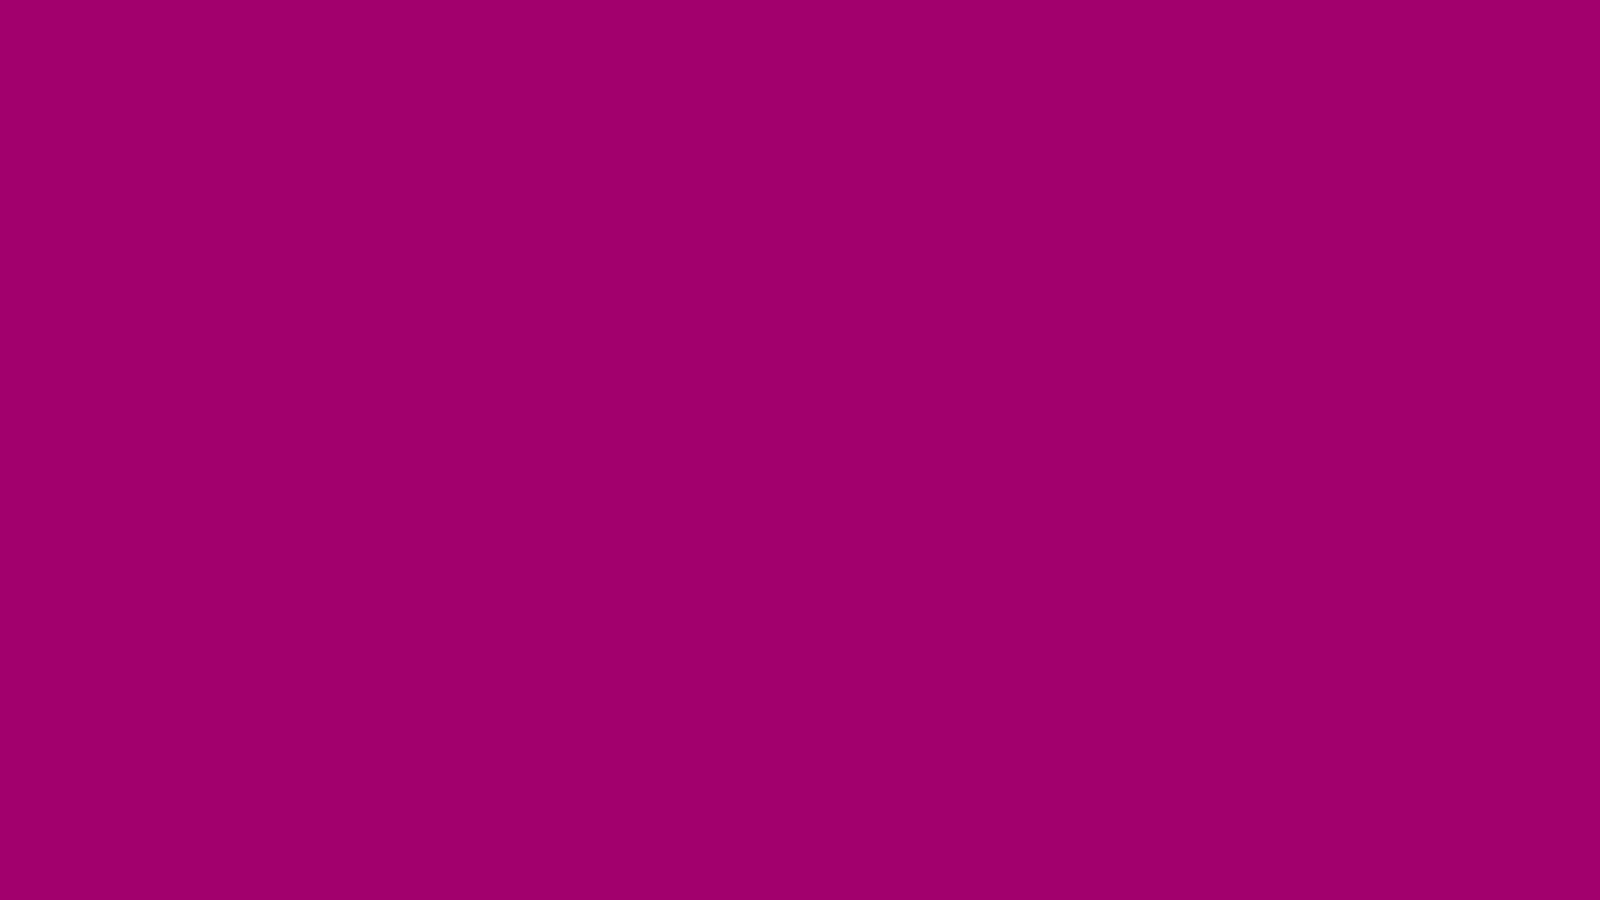 1600x900 Flirt Solid Color Background